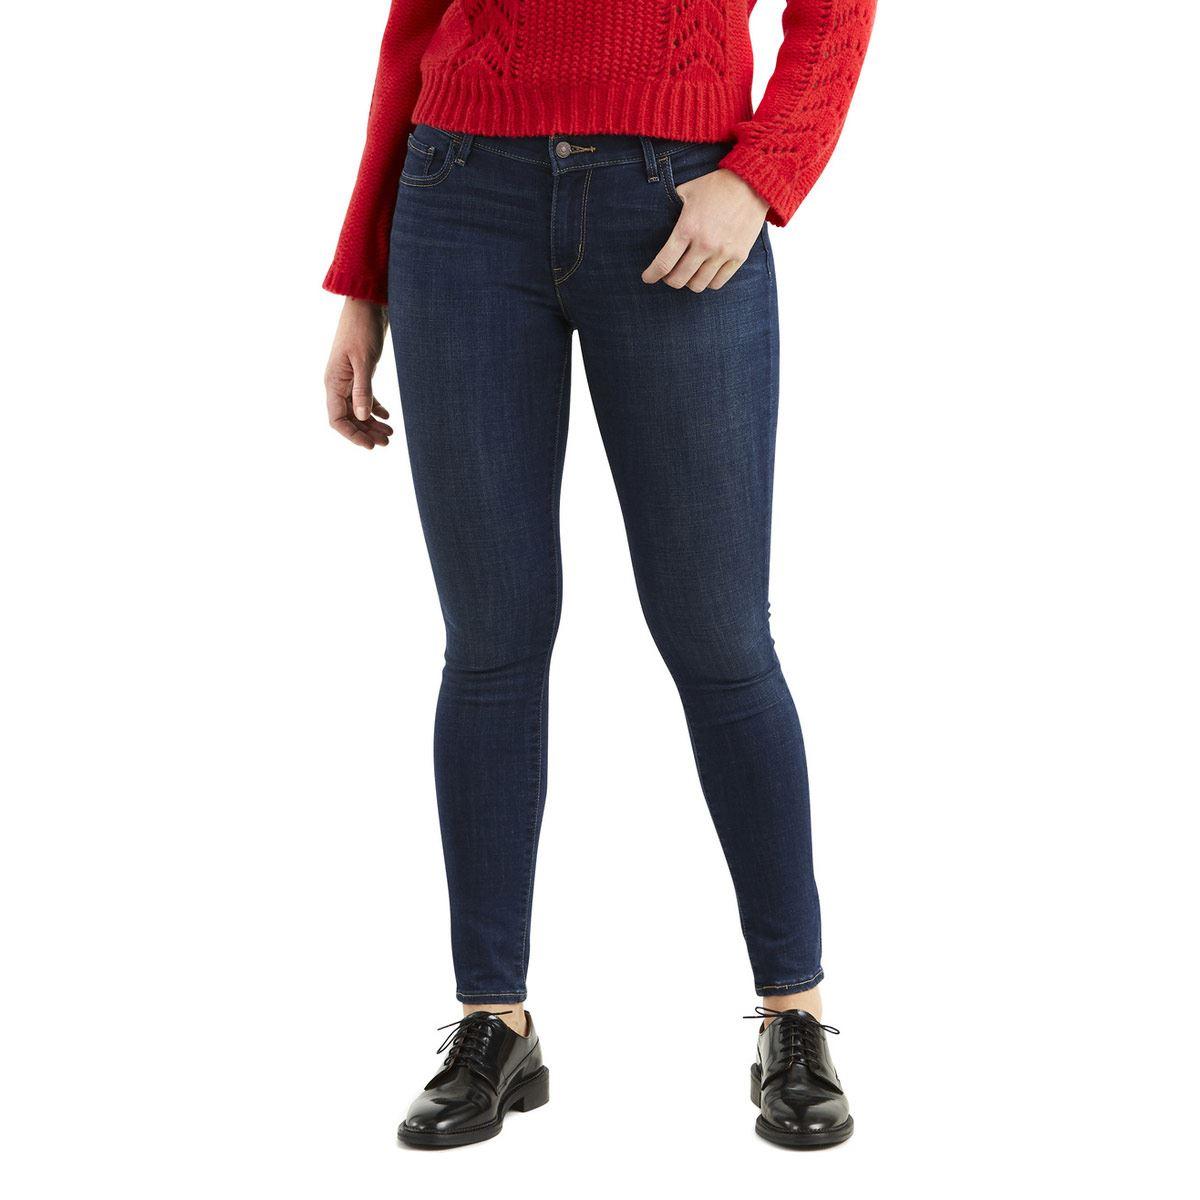 Levi's® 710 Super Skinny Jeans 28x32